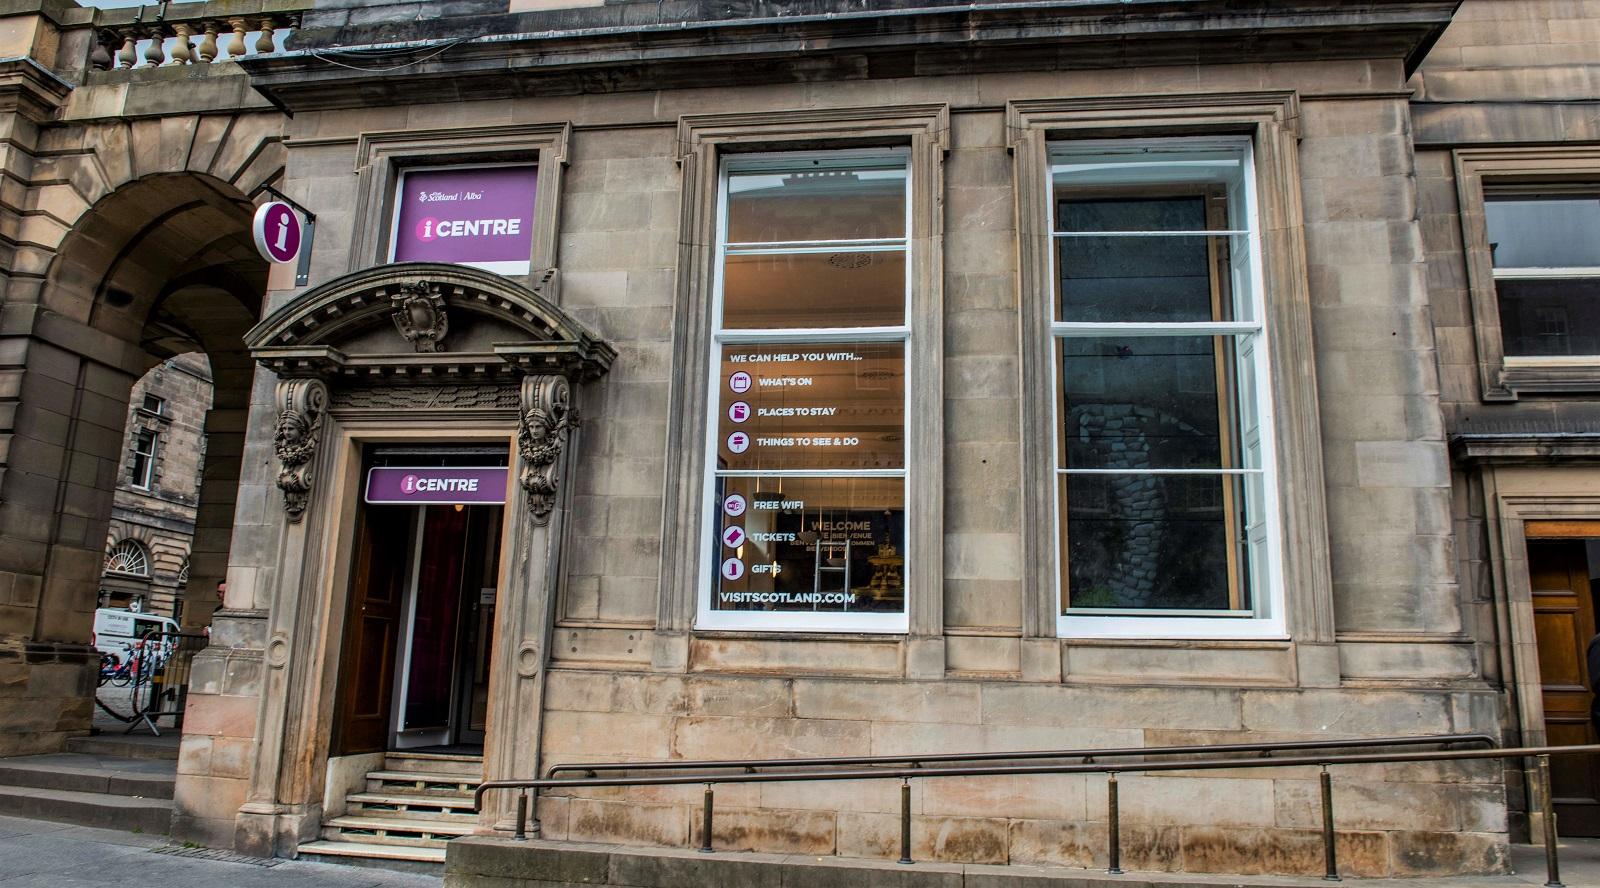 Edinburgh Visitor Information Centre